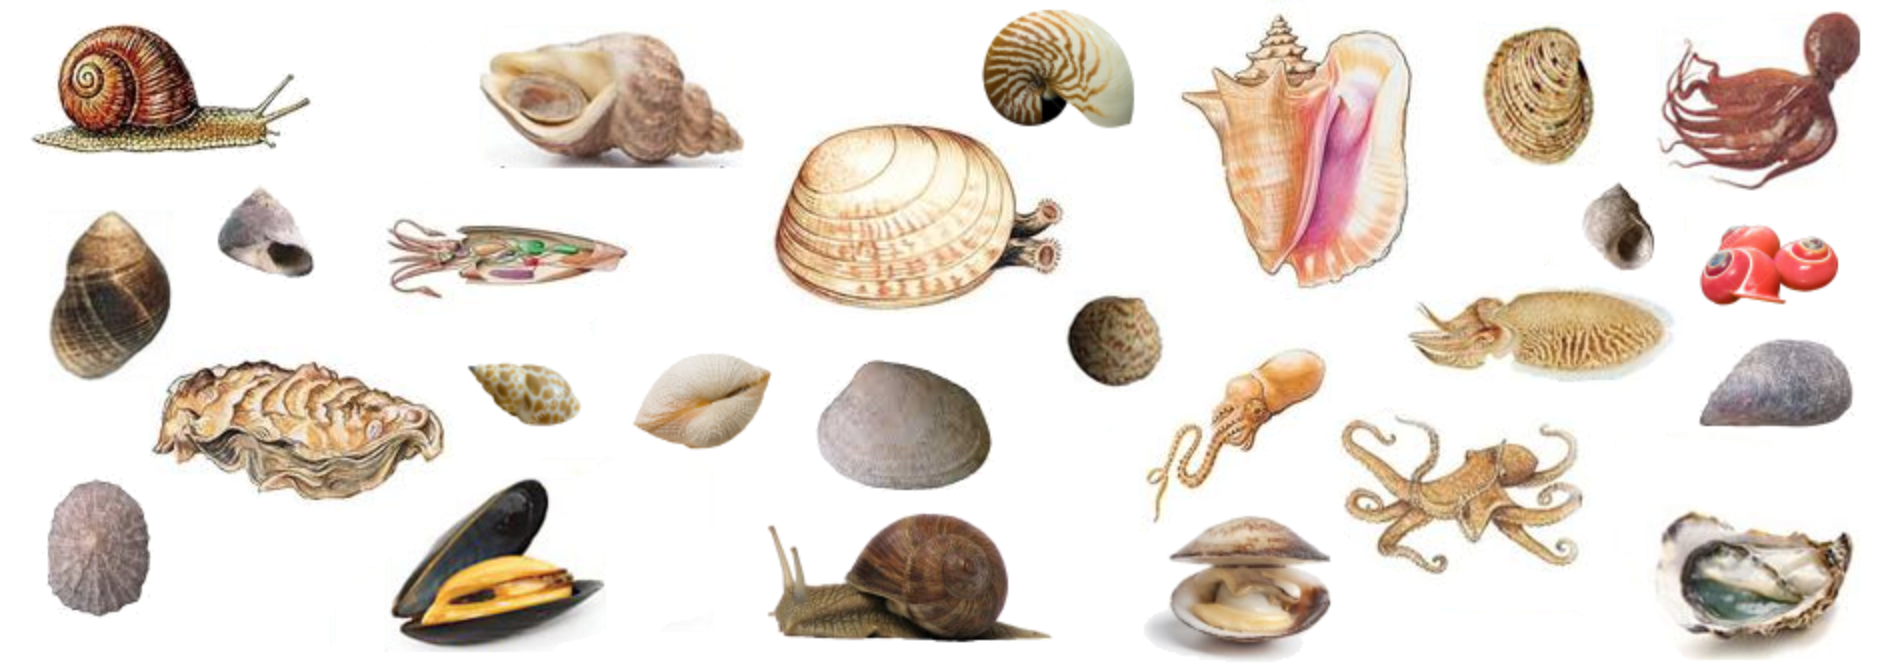 http://soutien67.free.fr/svt/animaux/zoo/mollusques/mollusques.htm